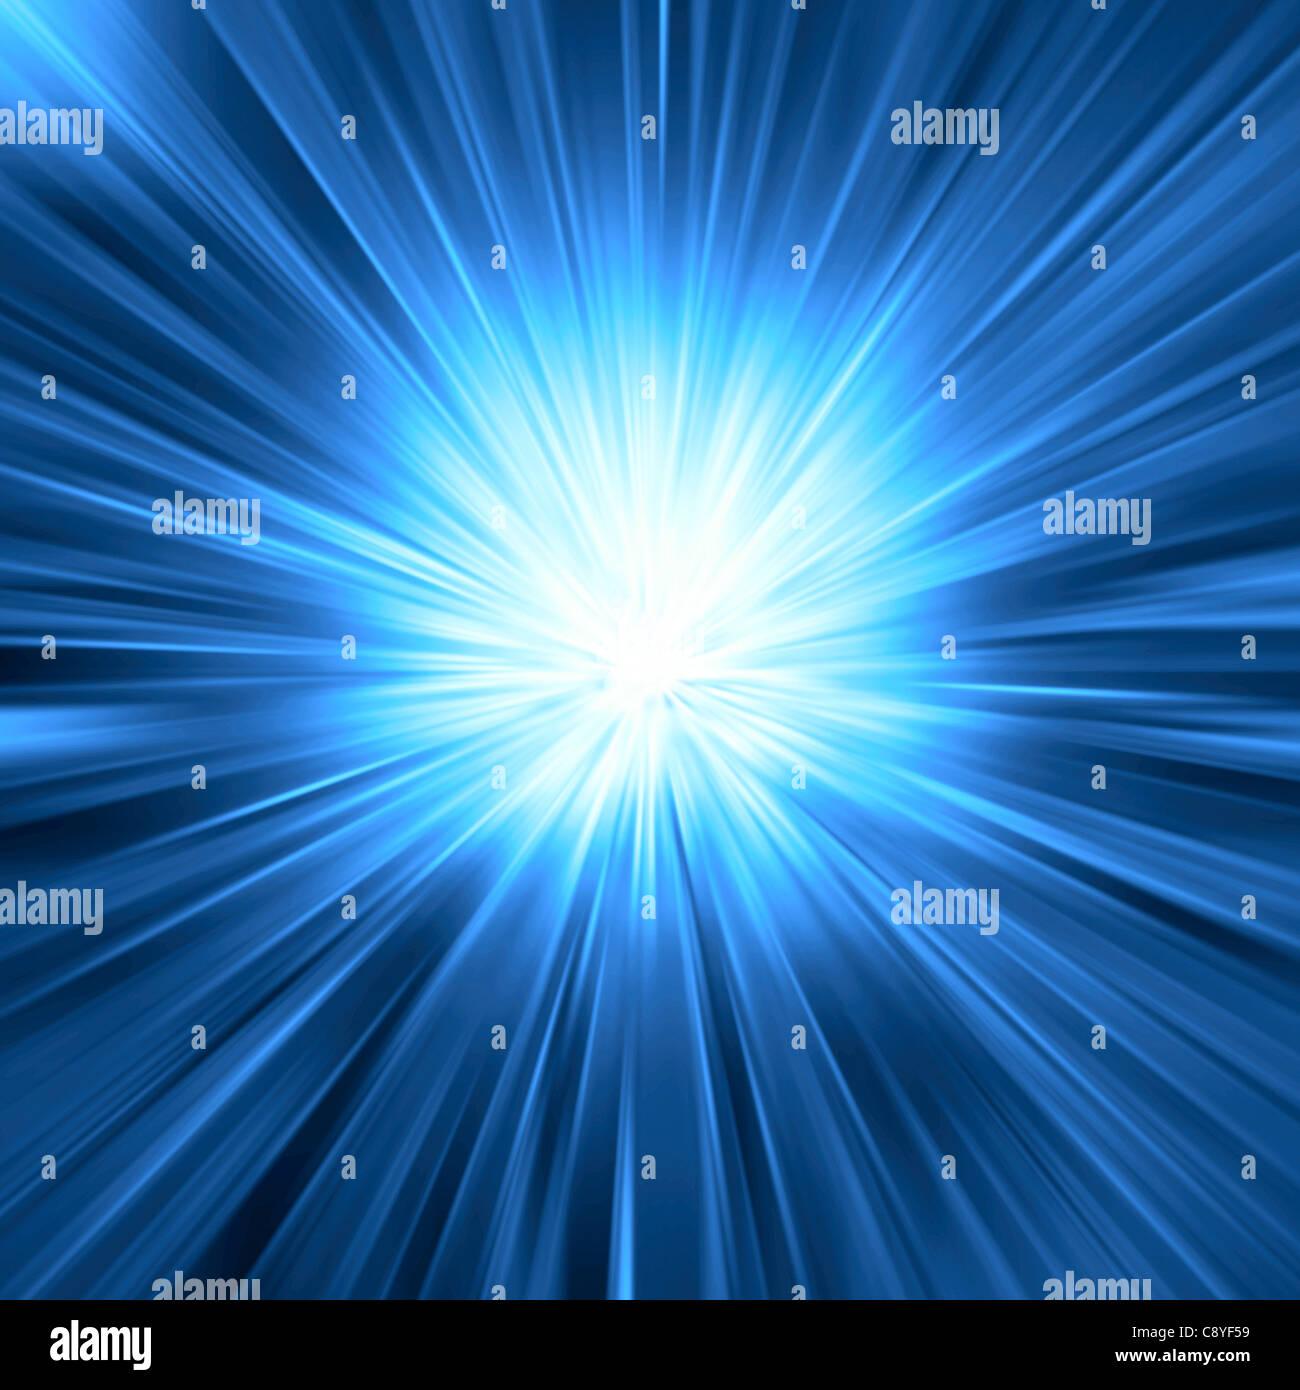 Blue light burst - Stock Image